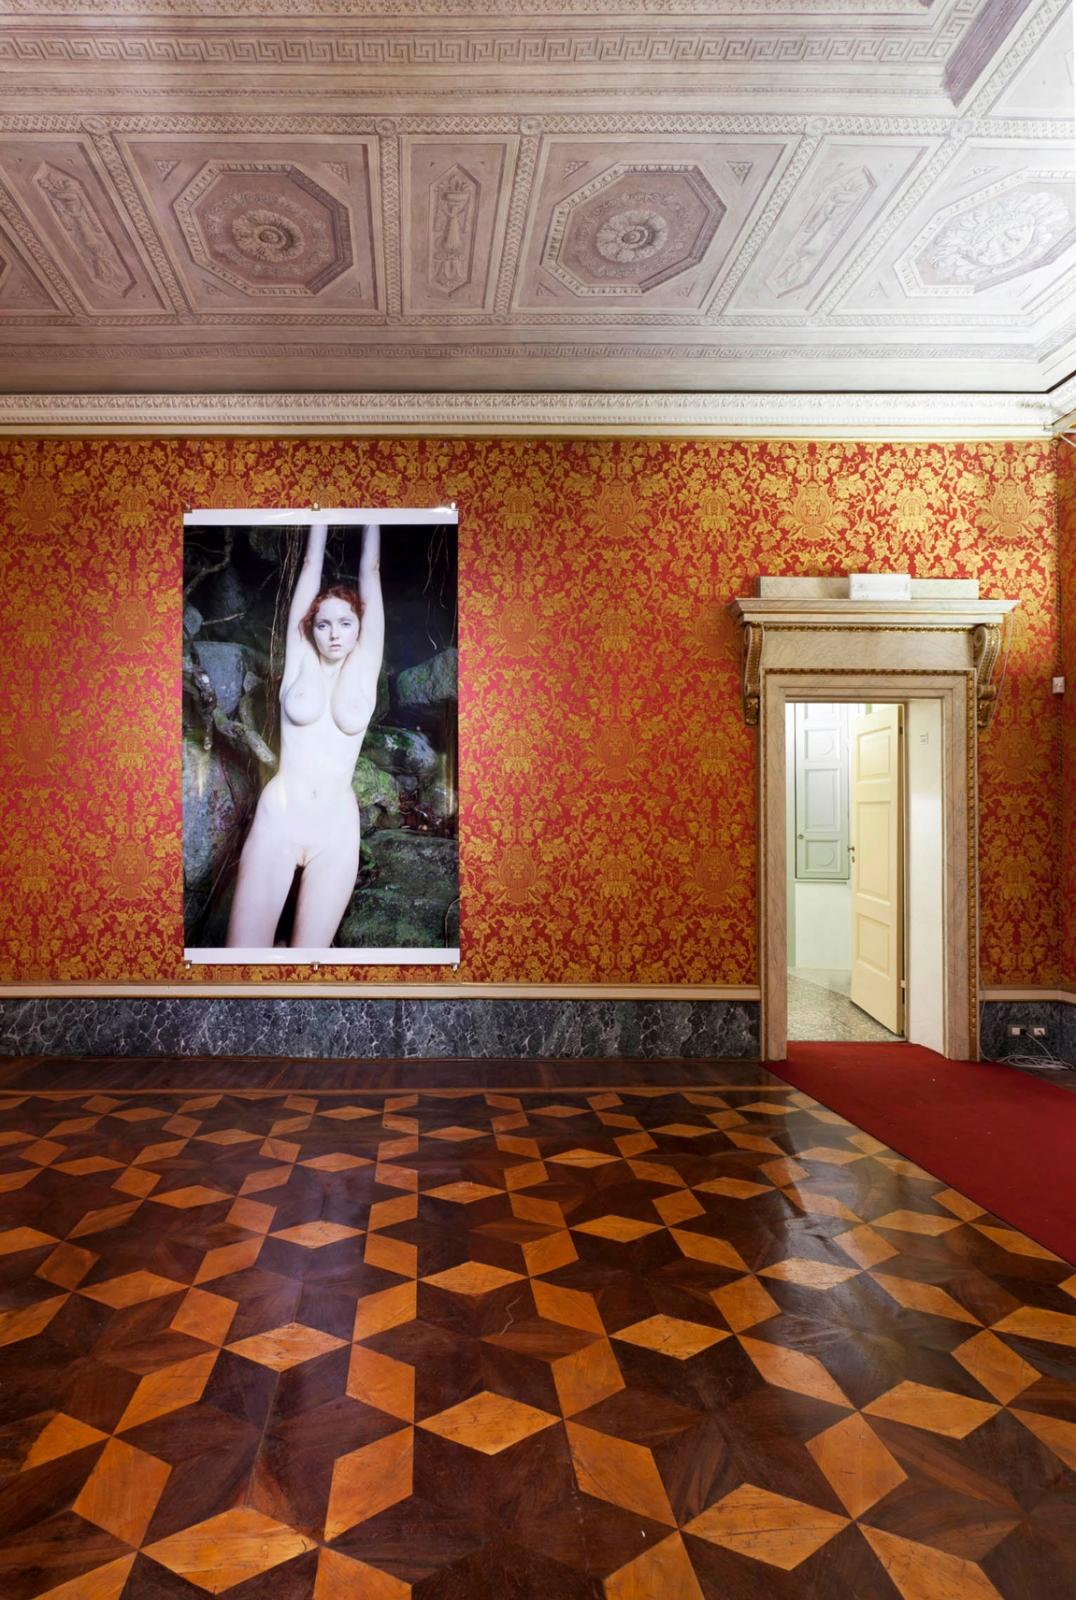 JUERGEN TELLER, Juergen Teller: The Girl with the Broken Nose